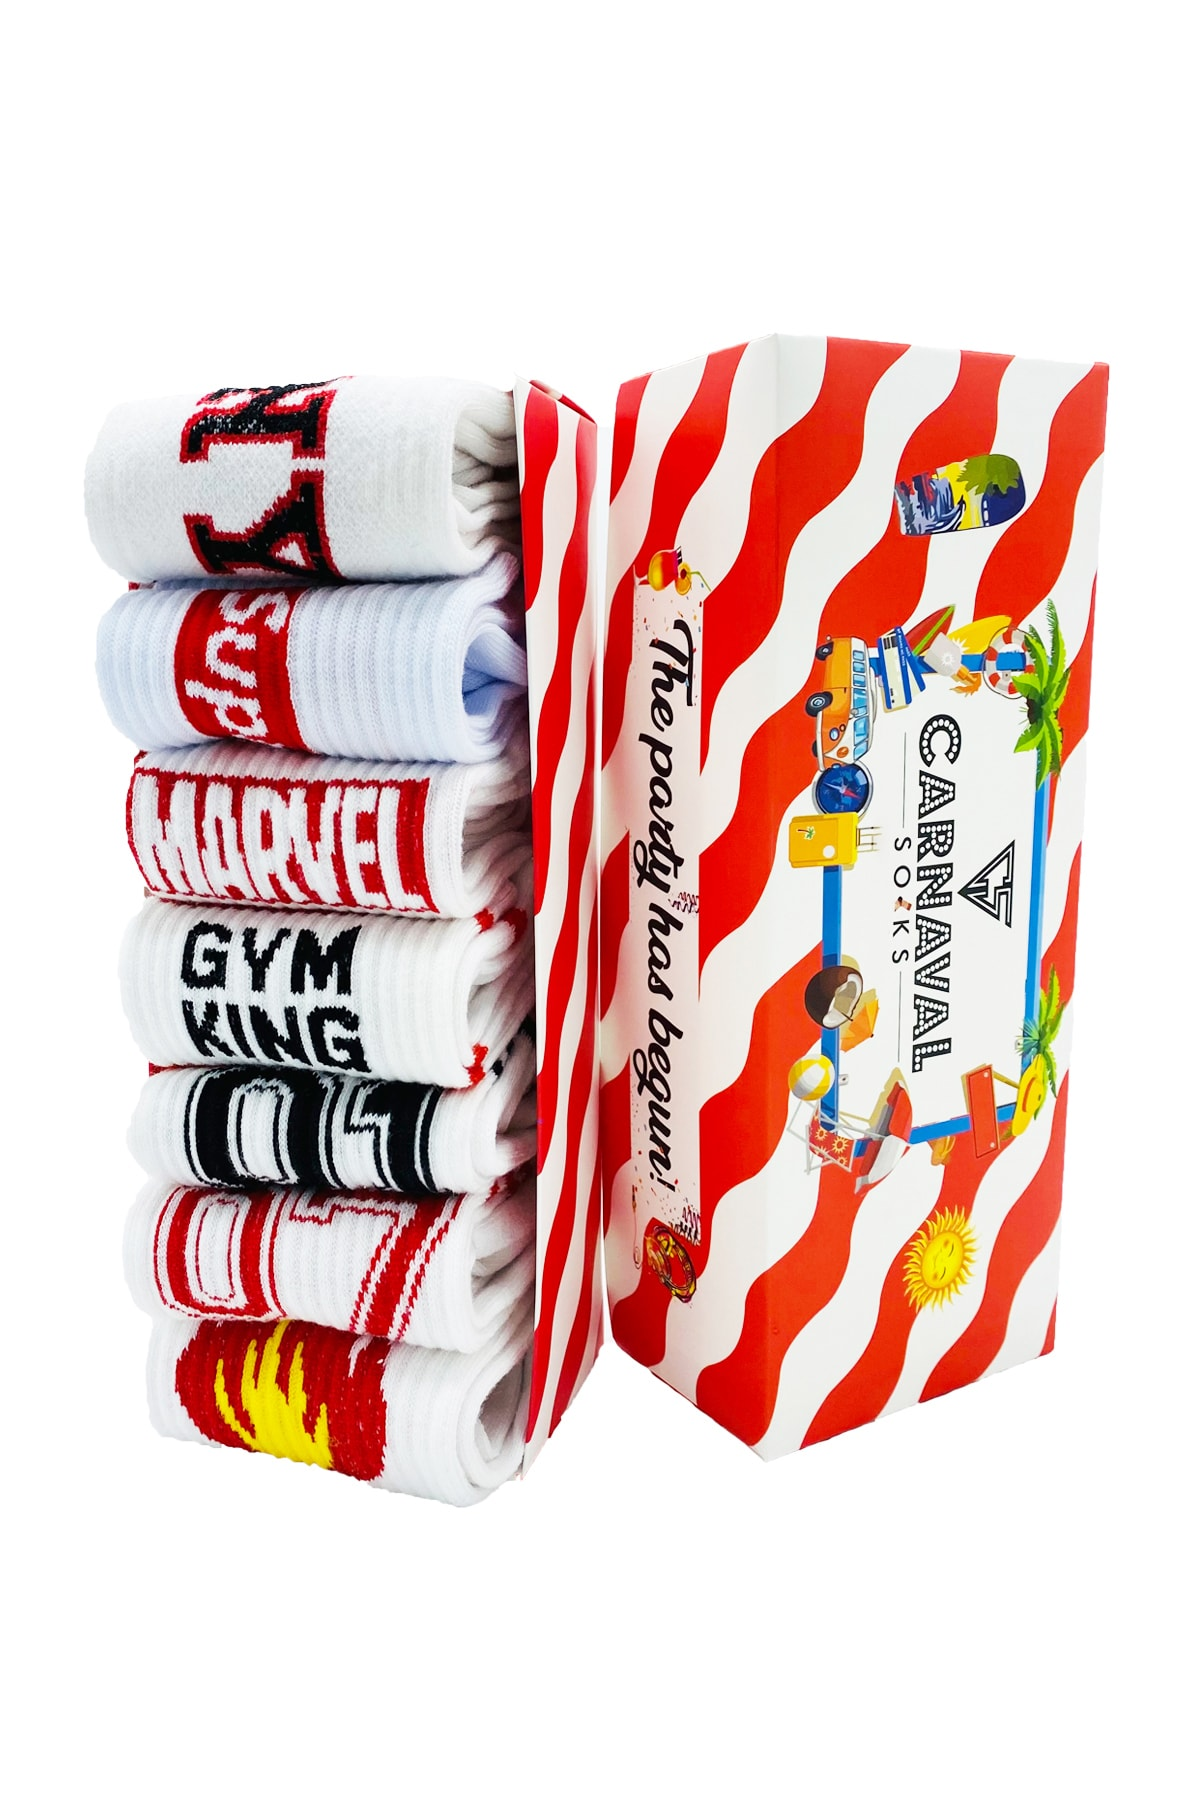 CARNAVAL SOCKS 7'li Spor-2 Gym Atletik Spor Çorap Set  1023 1